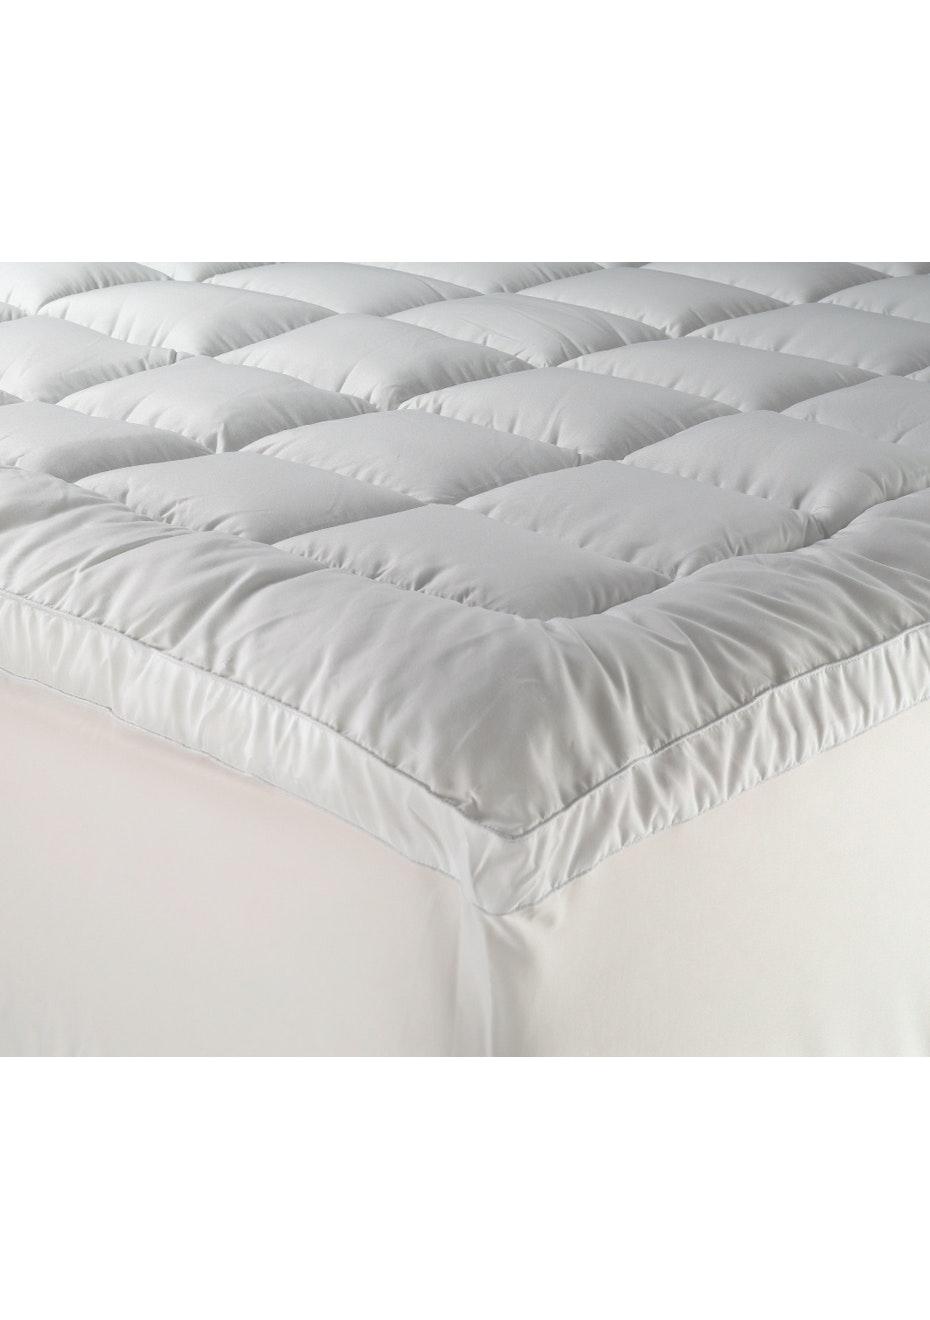 Super Loft Mattress Protector - 800GSM - Queen Bed